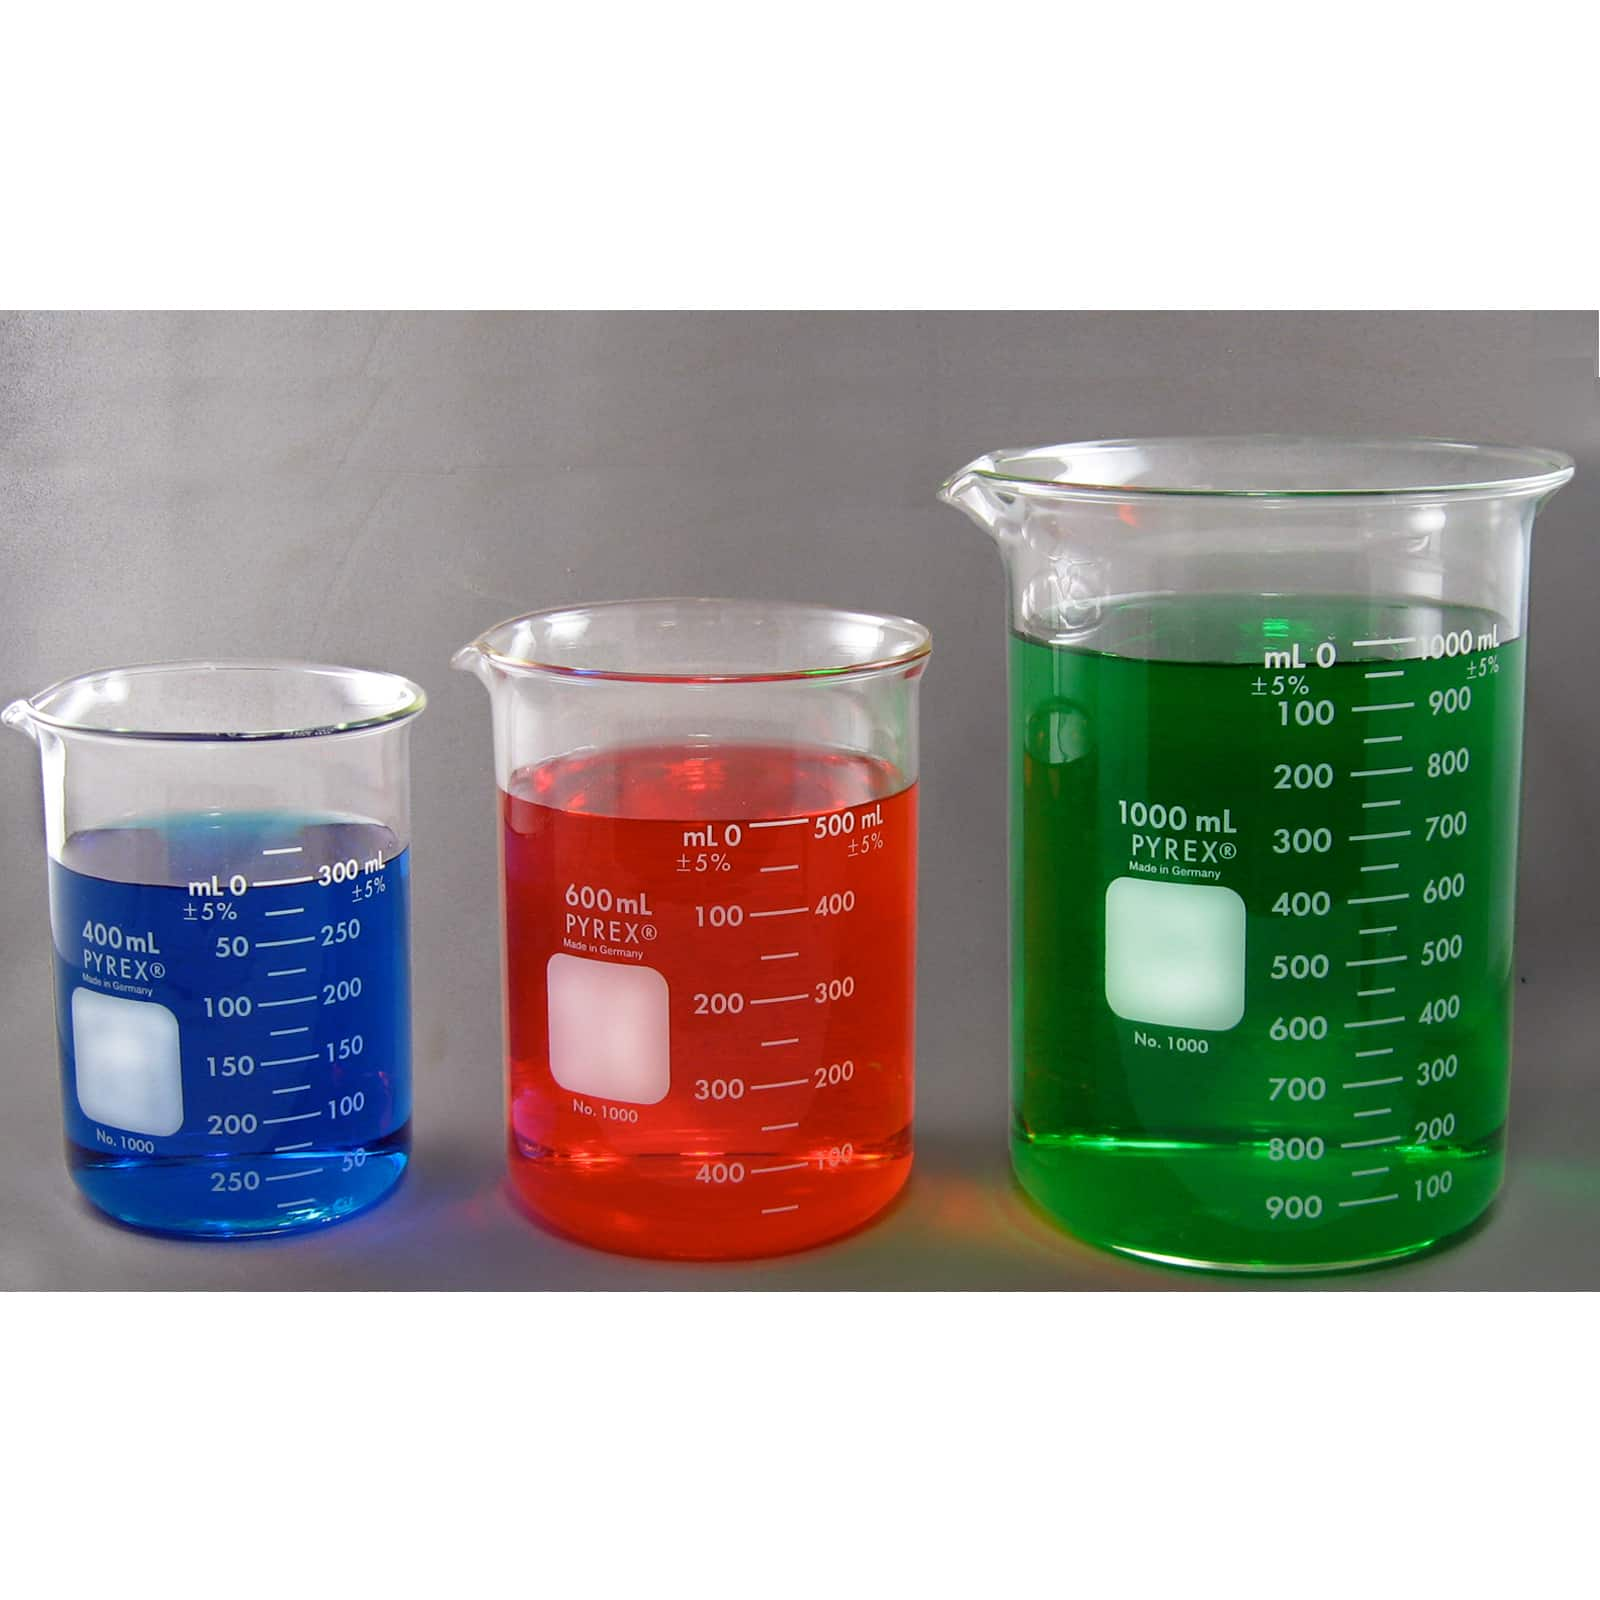 Pyrex Beaker Set - 400ml, 600ml, 1000ml